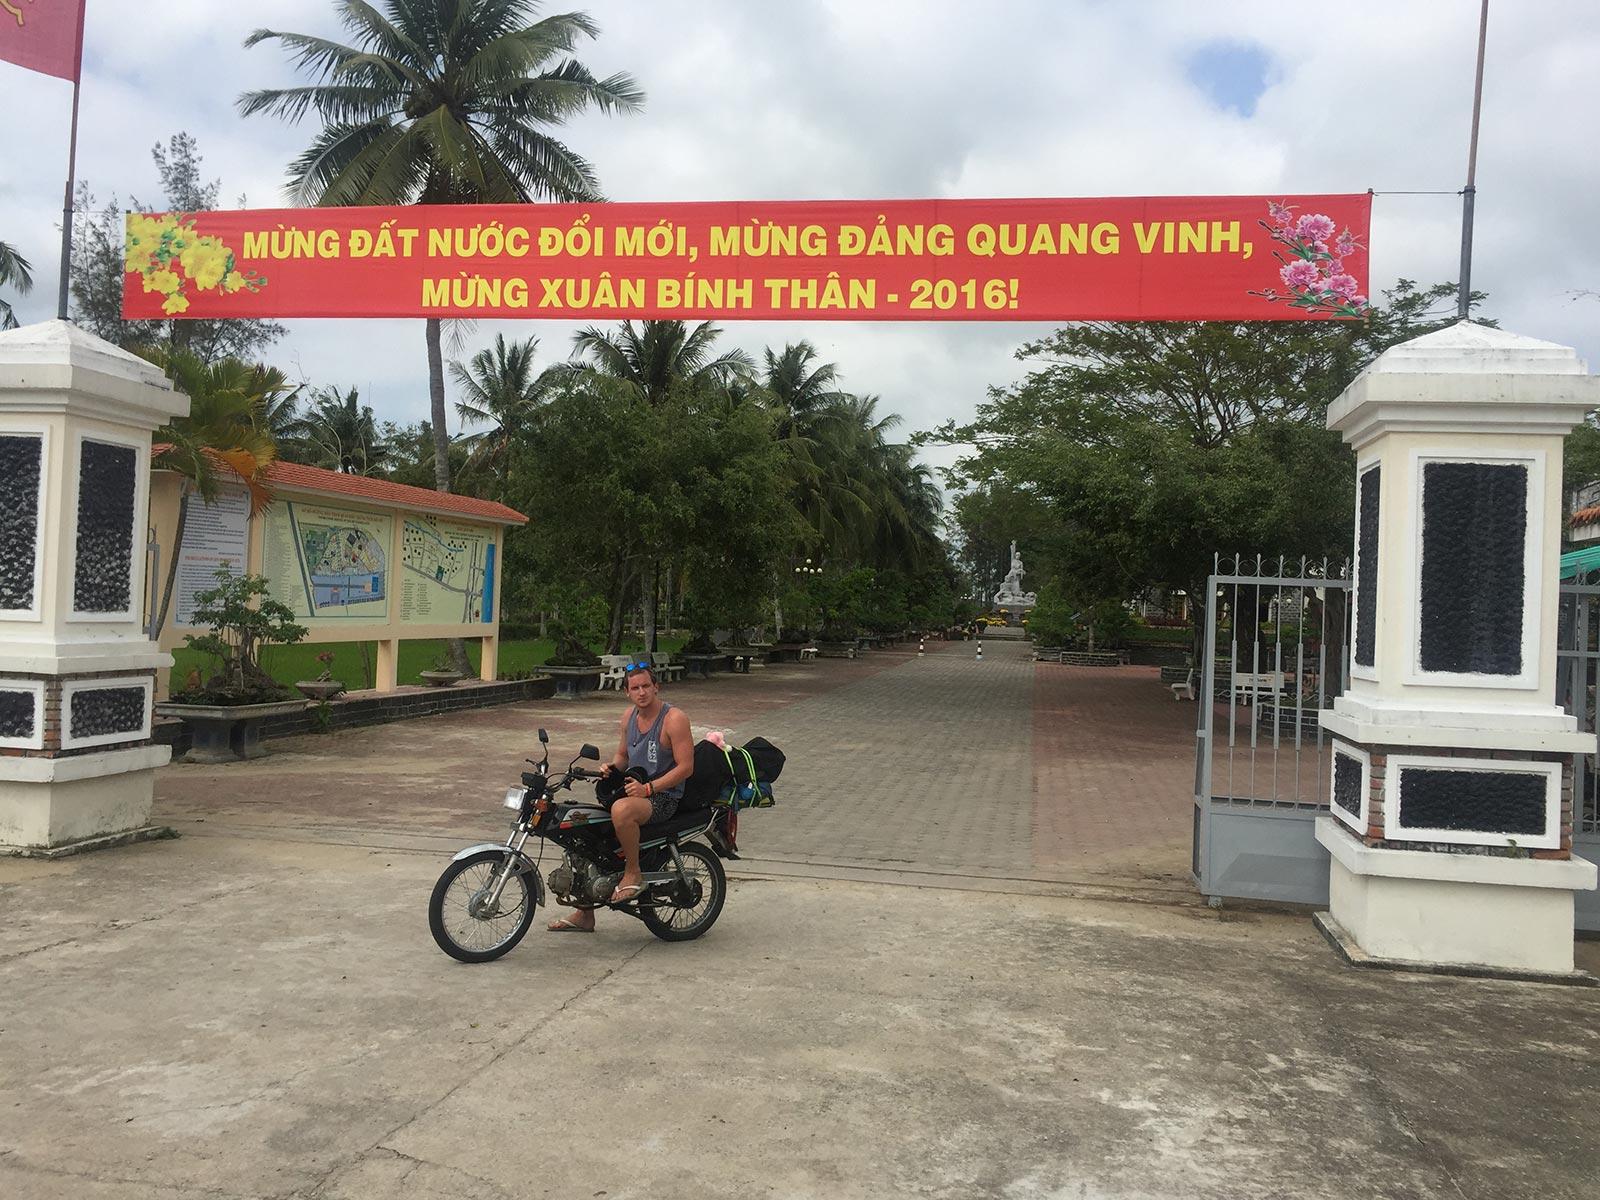 David Simpson riding a motorbike in Quy Nhon, Vietnam. The Vietnamese clubs